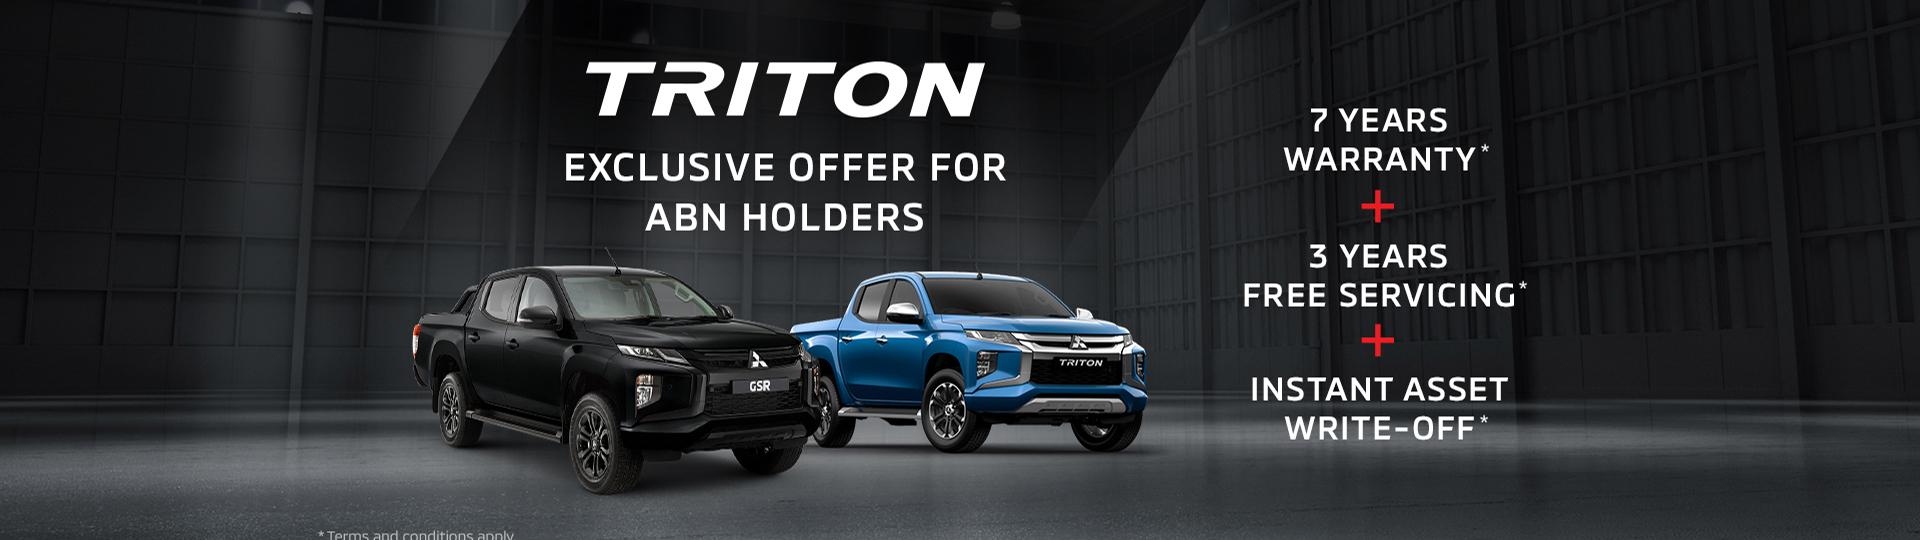 Triton ABN Holder offer